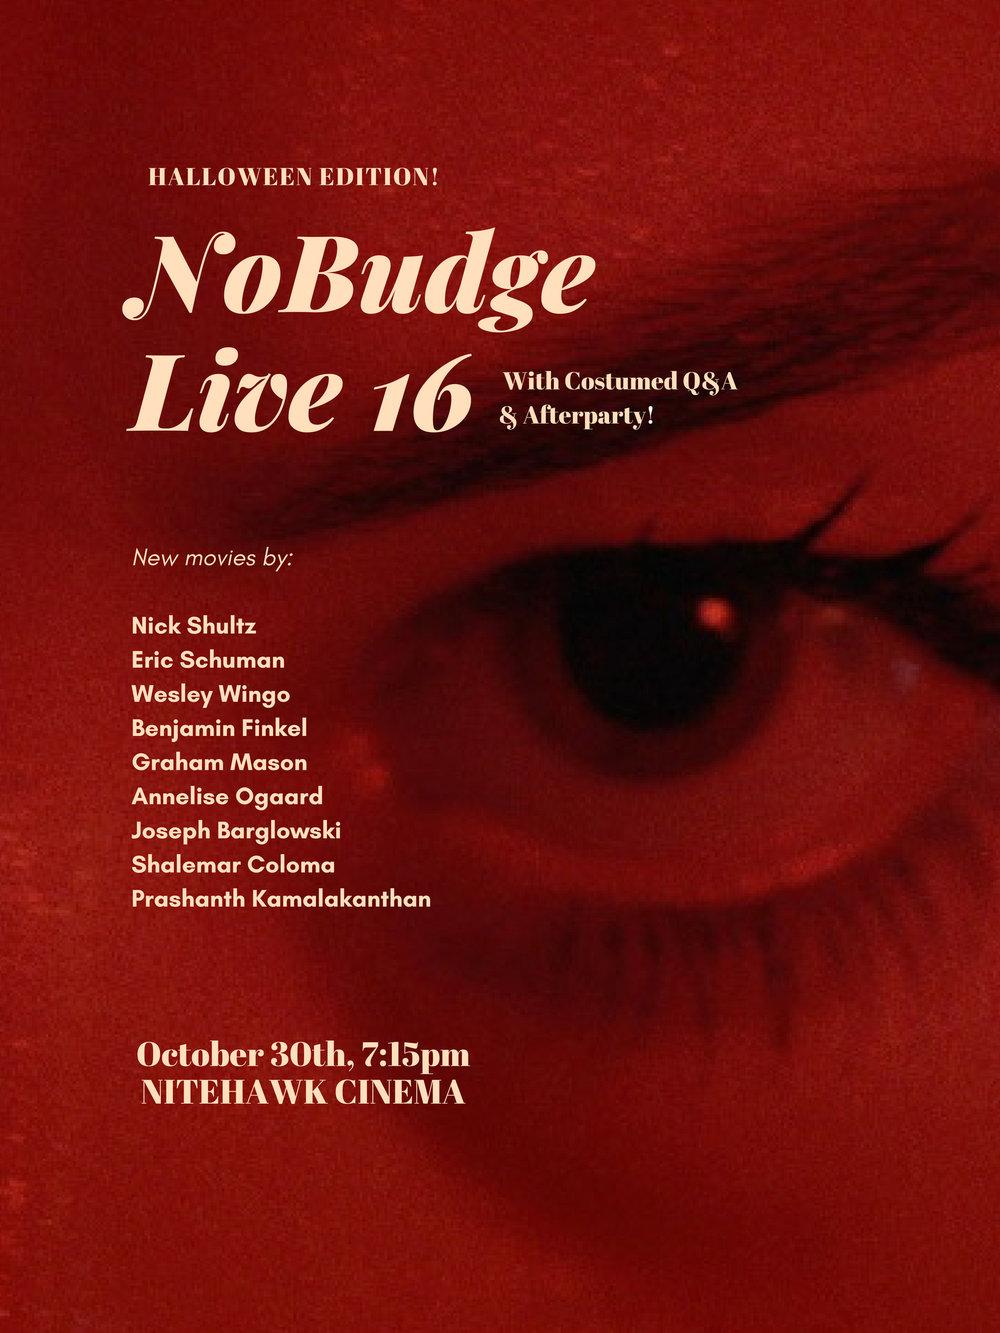 NoBudge Live 16 (1).jpg